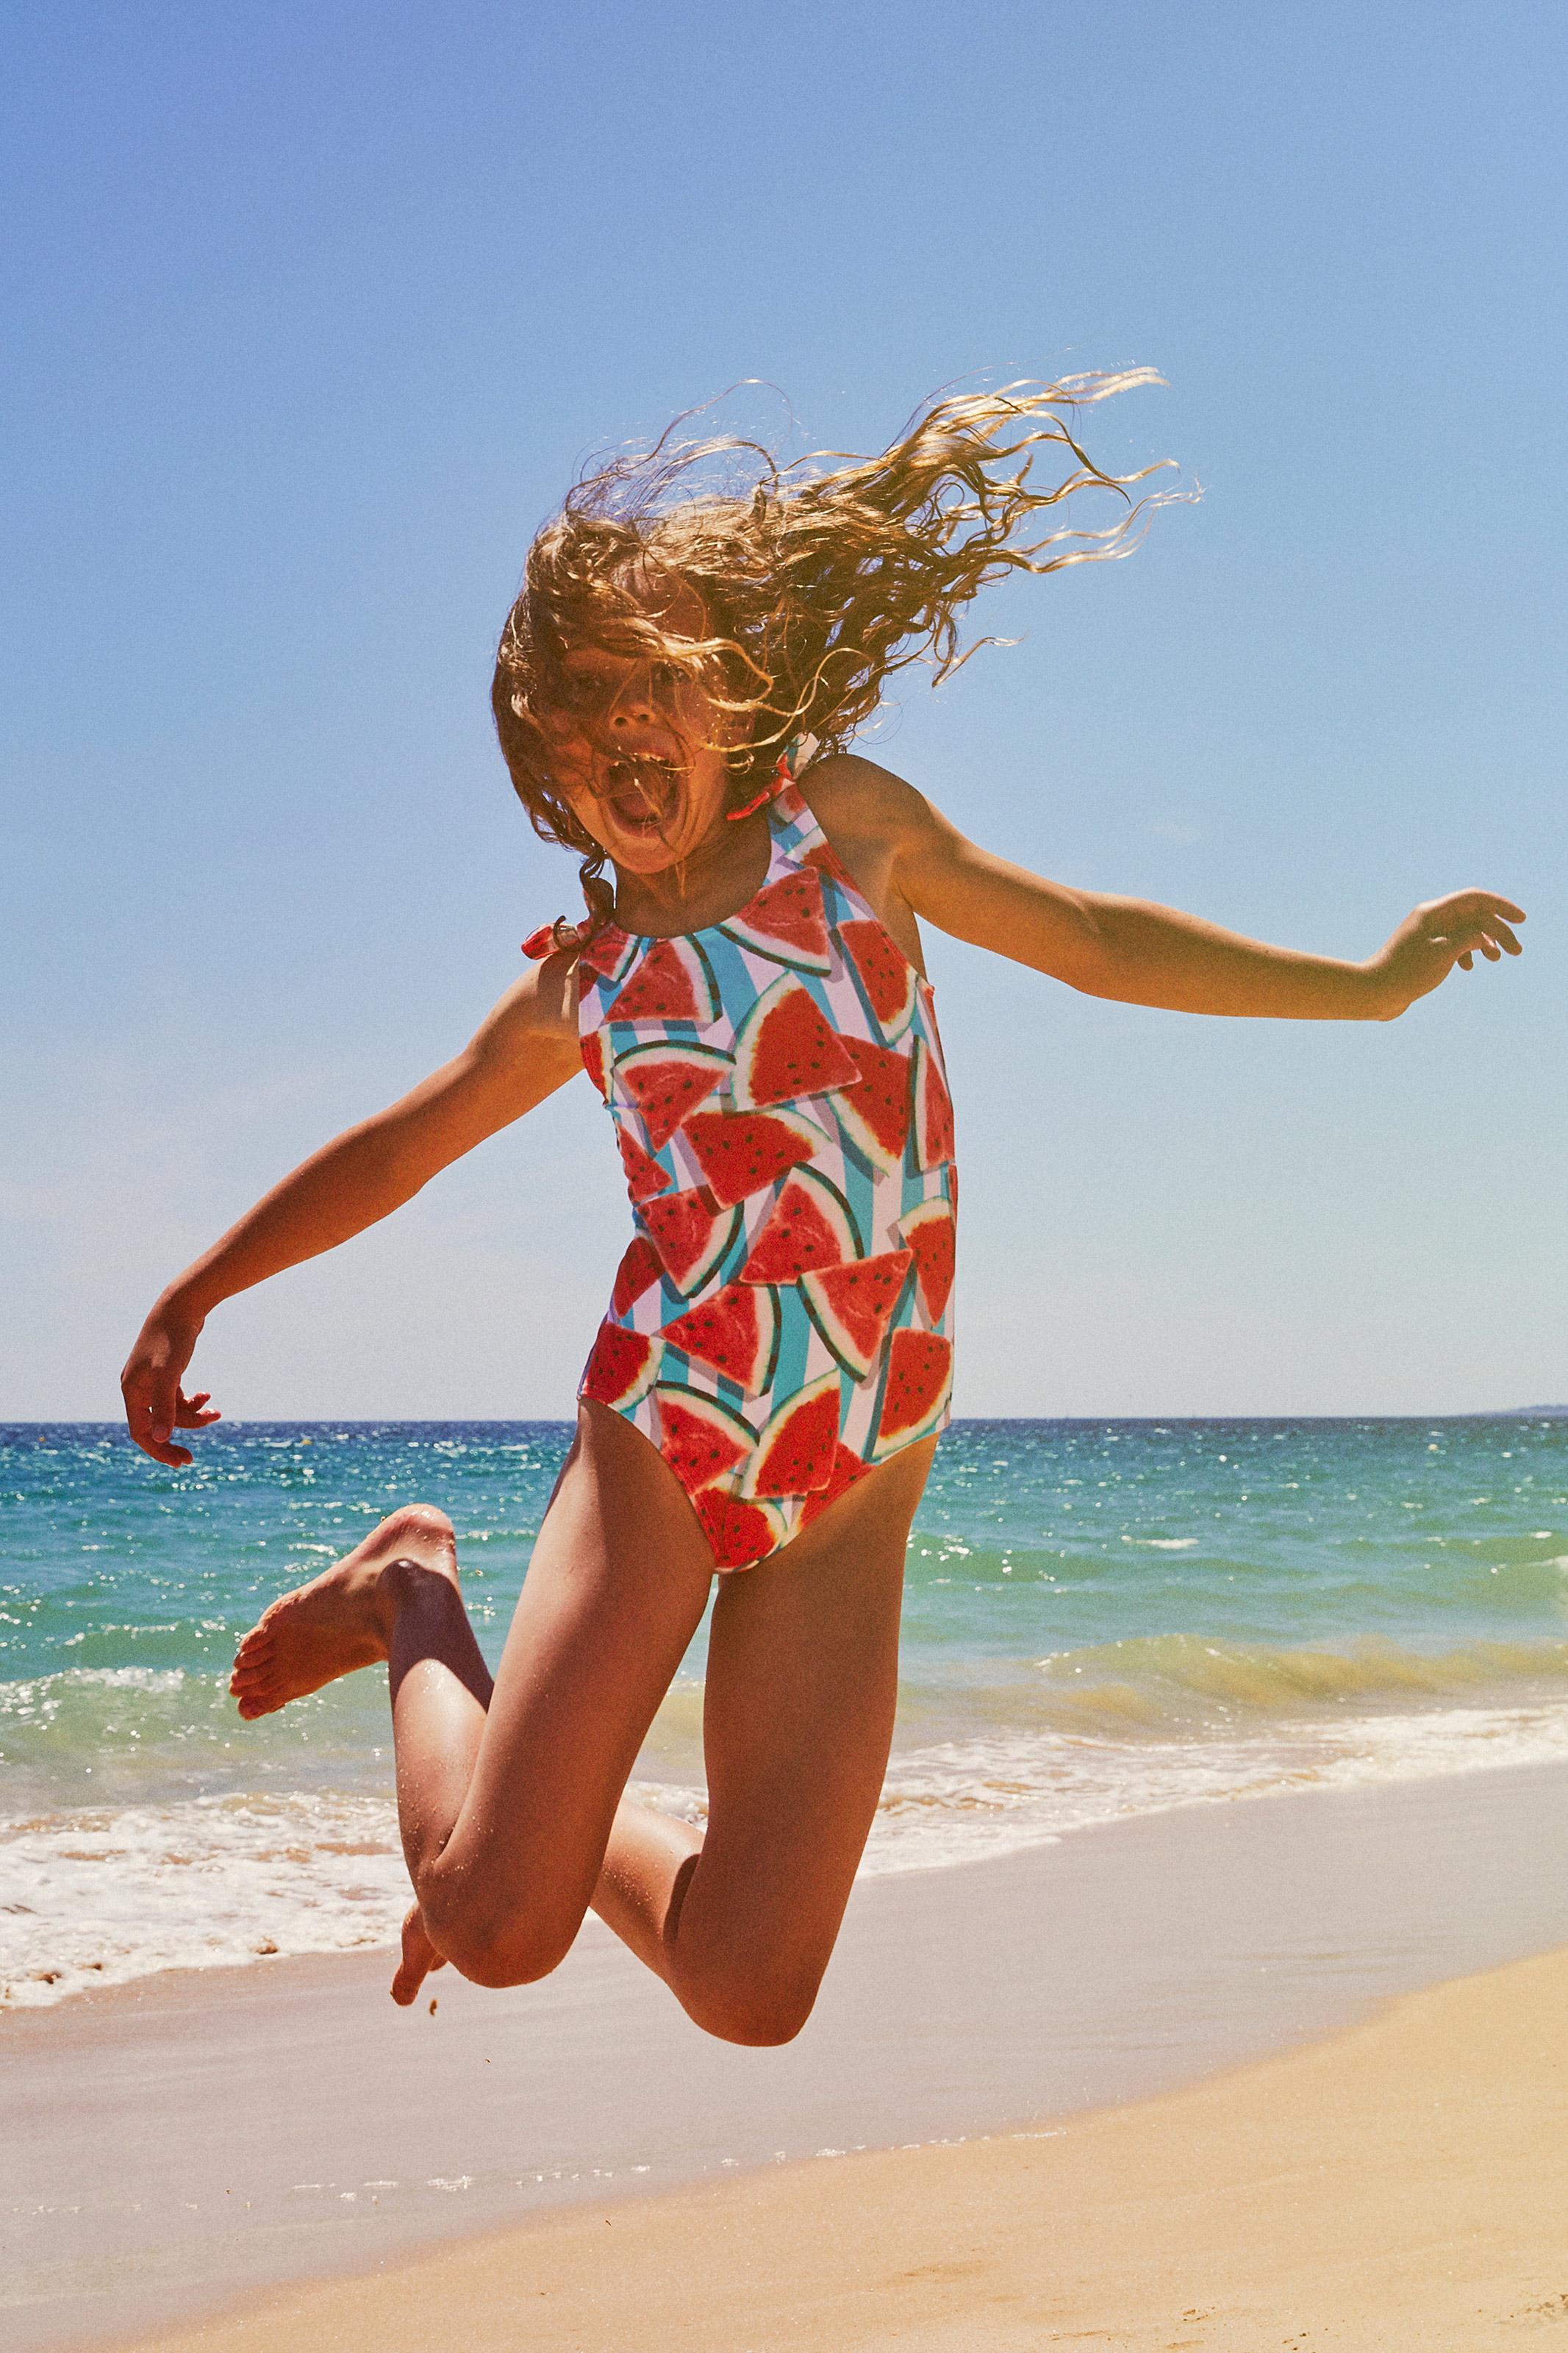 Girl playing on beach